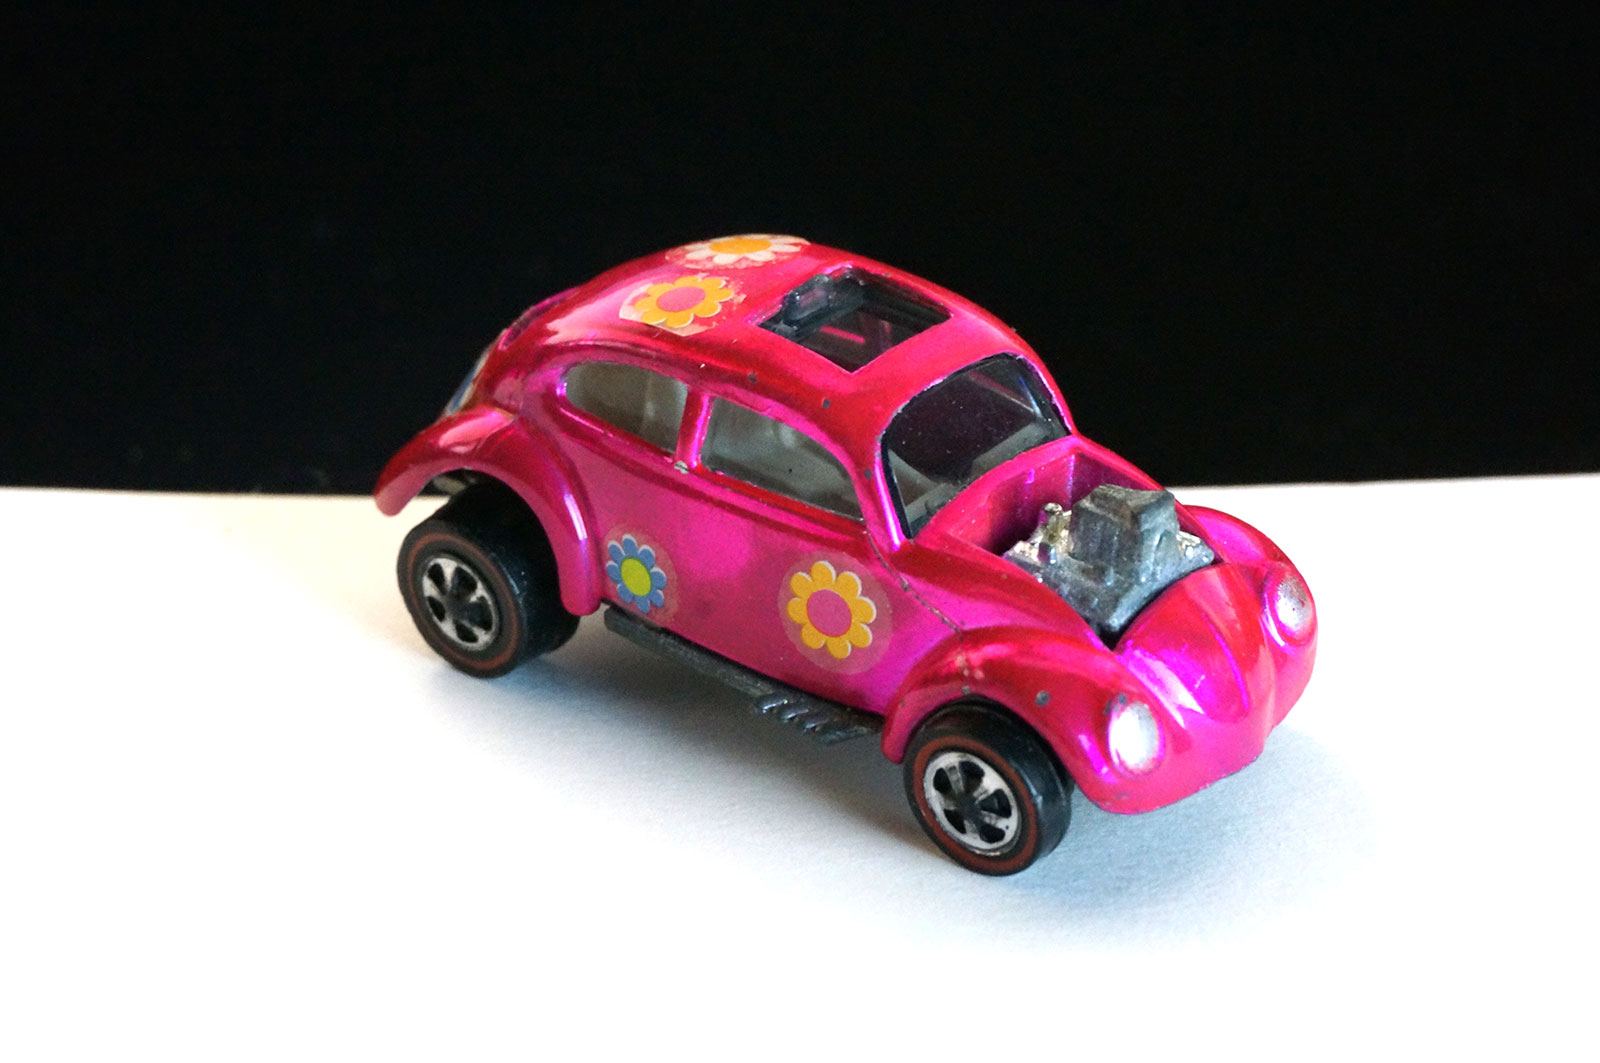 Hot Wheels Redline Hot Pink Custom Volkswagen US Flower Power